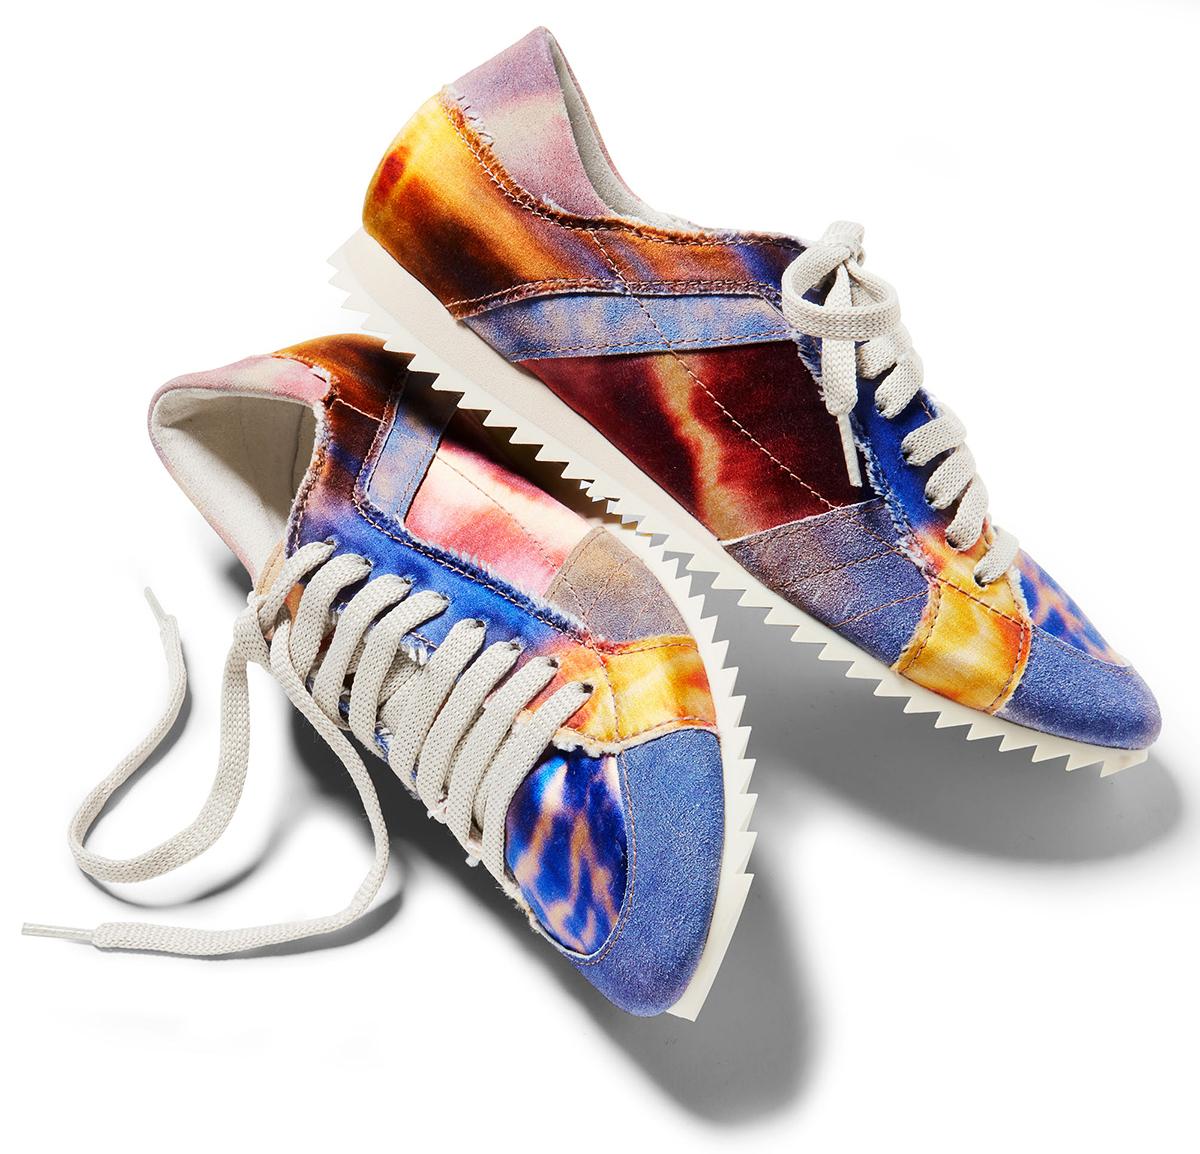 raquel allegra pedro garcia sneakers